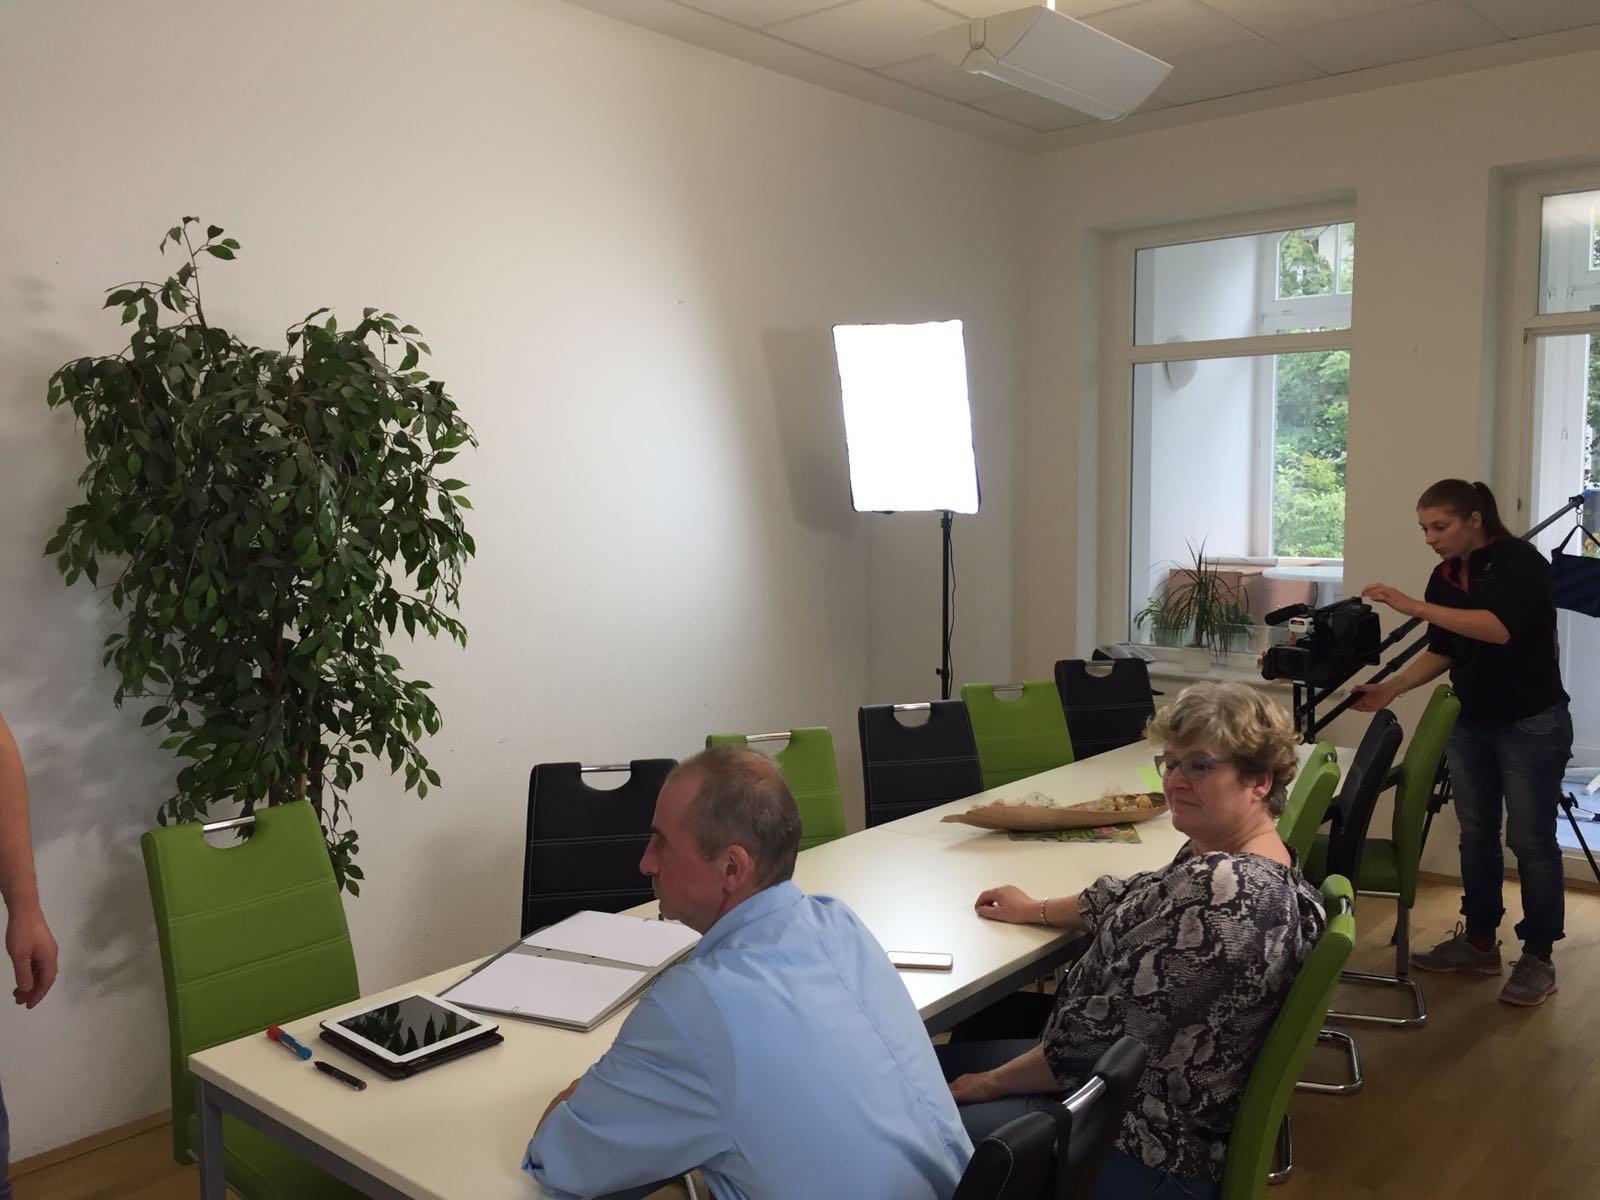 Dreh Konferenzraum mit Kran